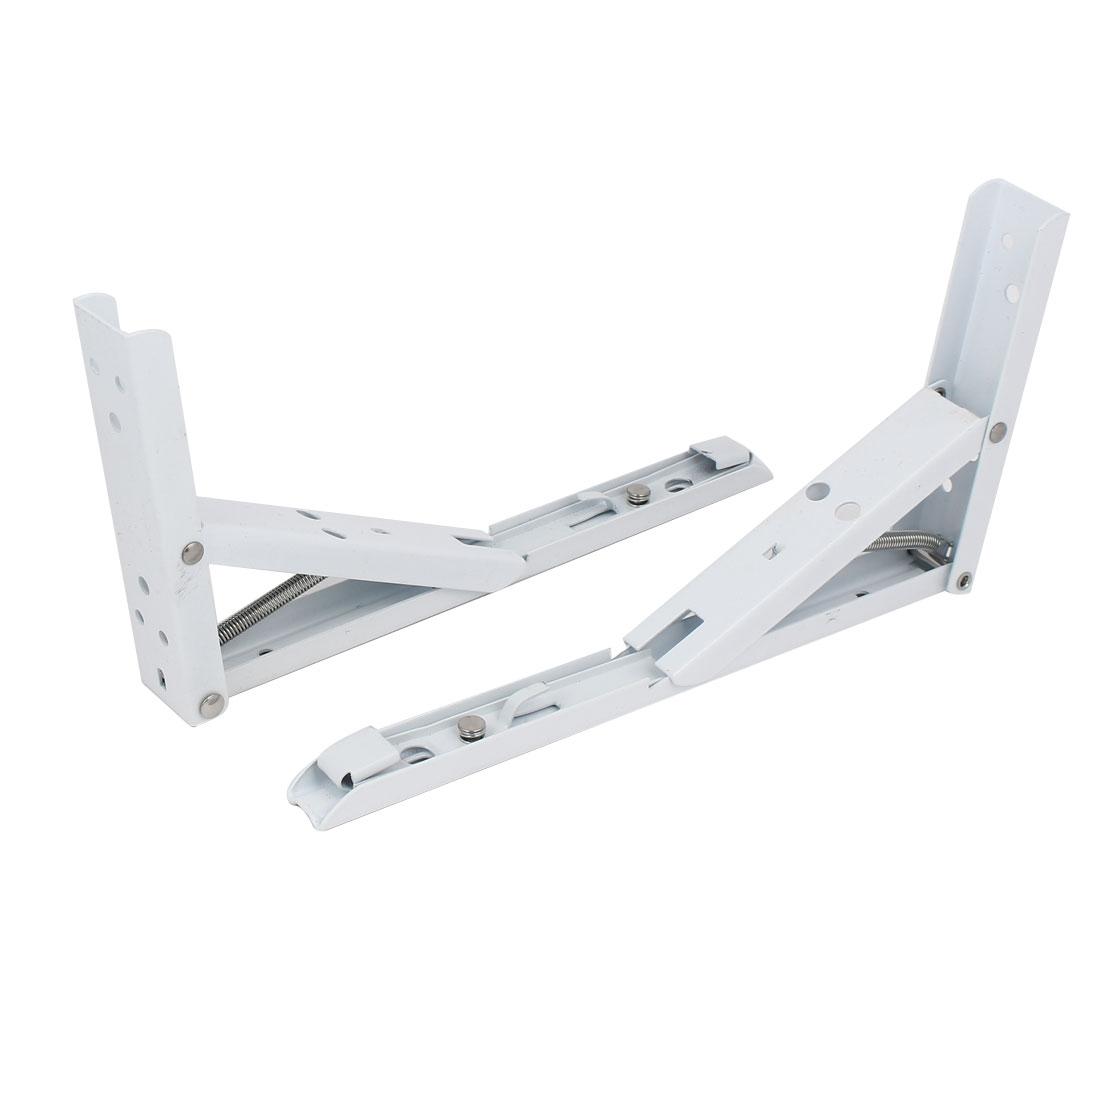 10-inch Long Metal Spring Loaded Folding Shelf Bracket Support White 2pcs